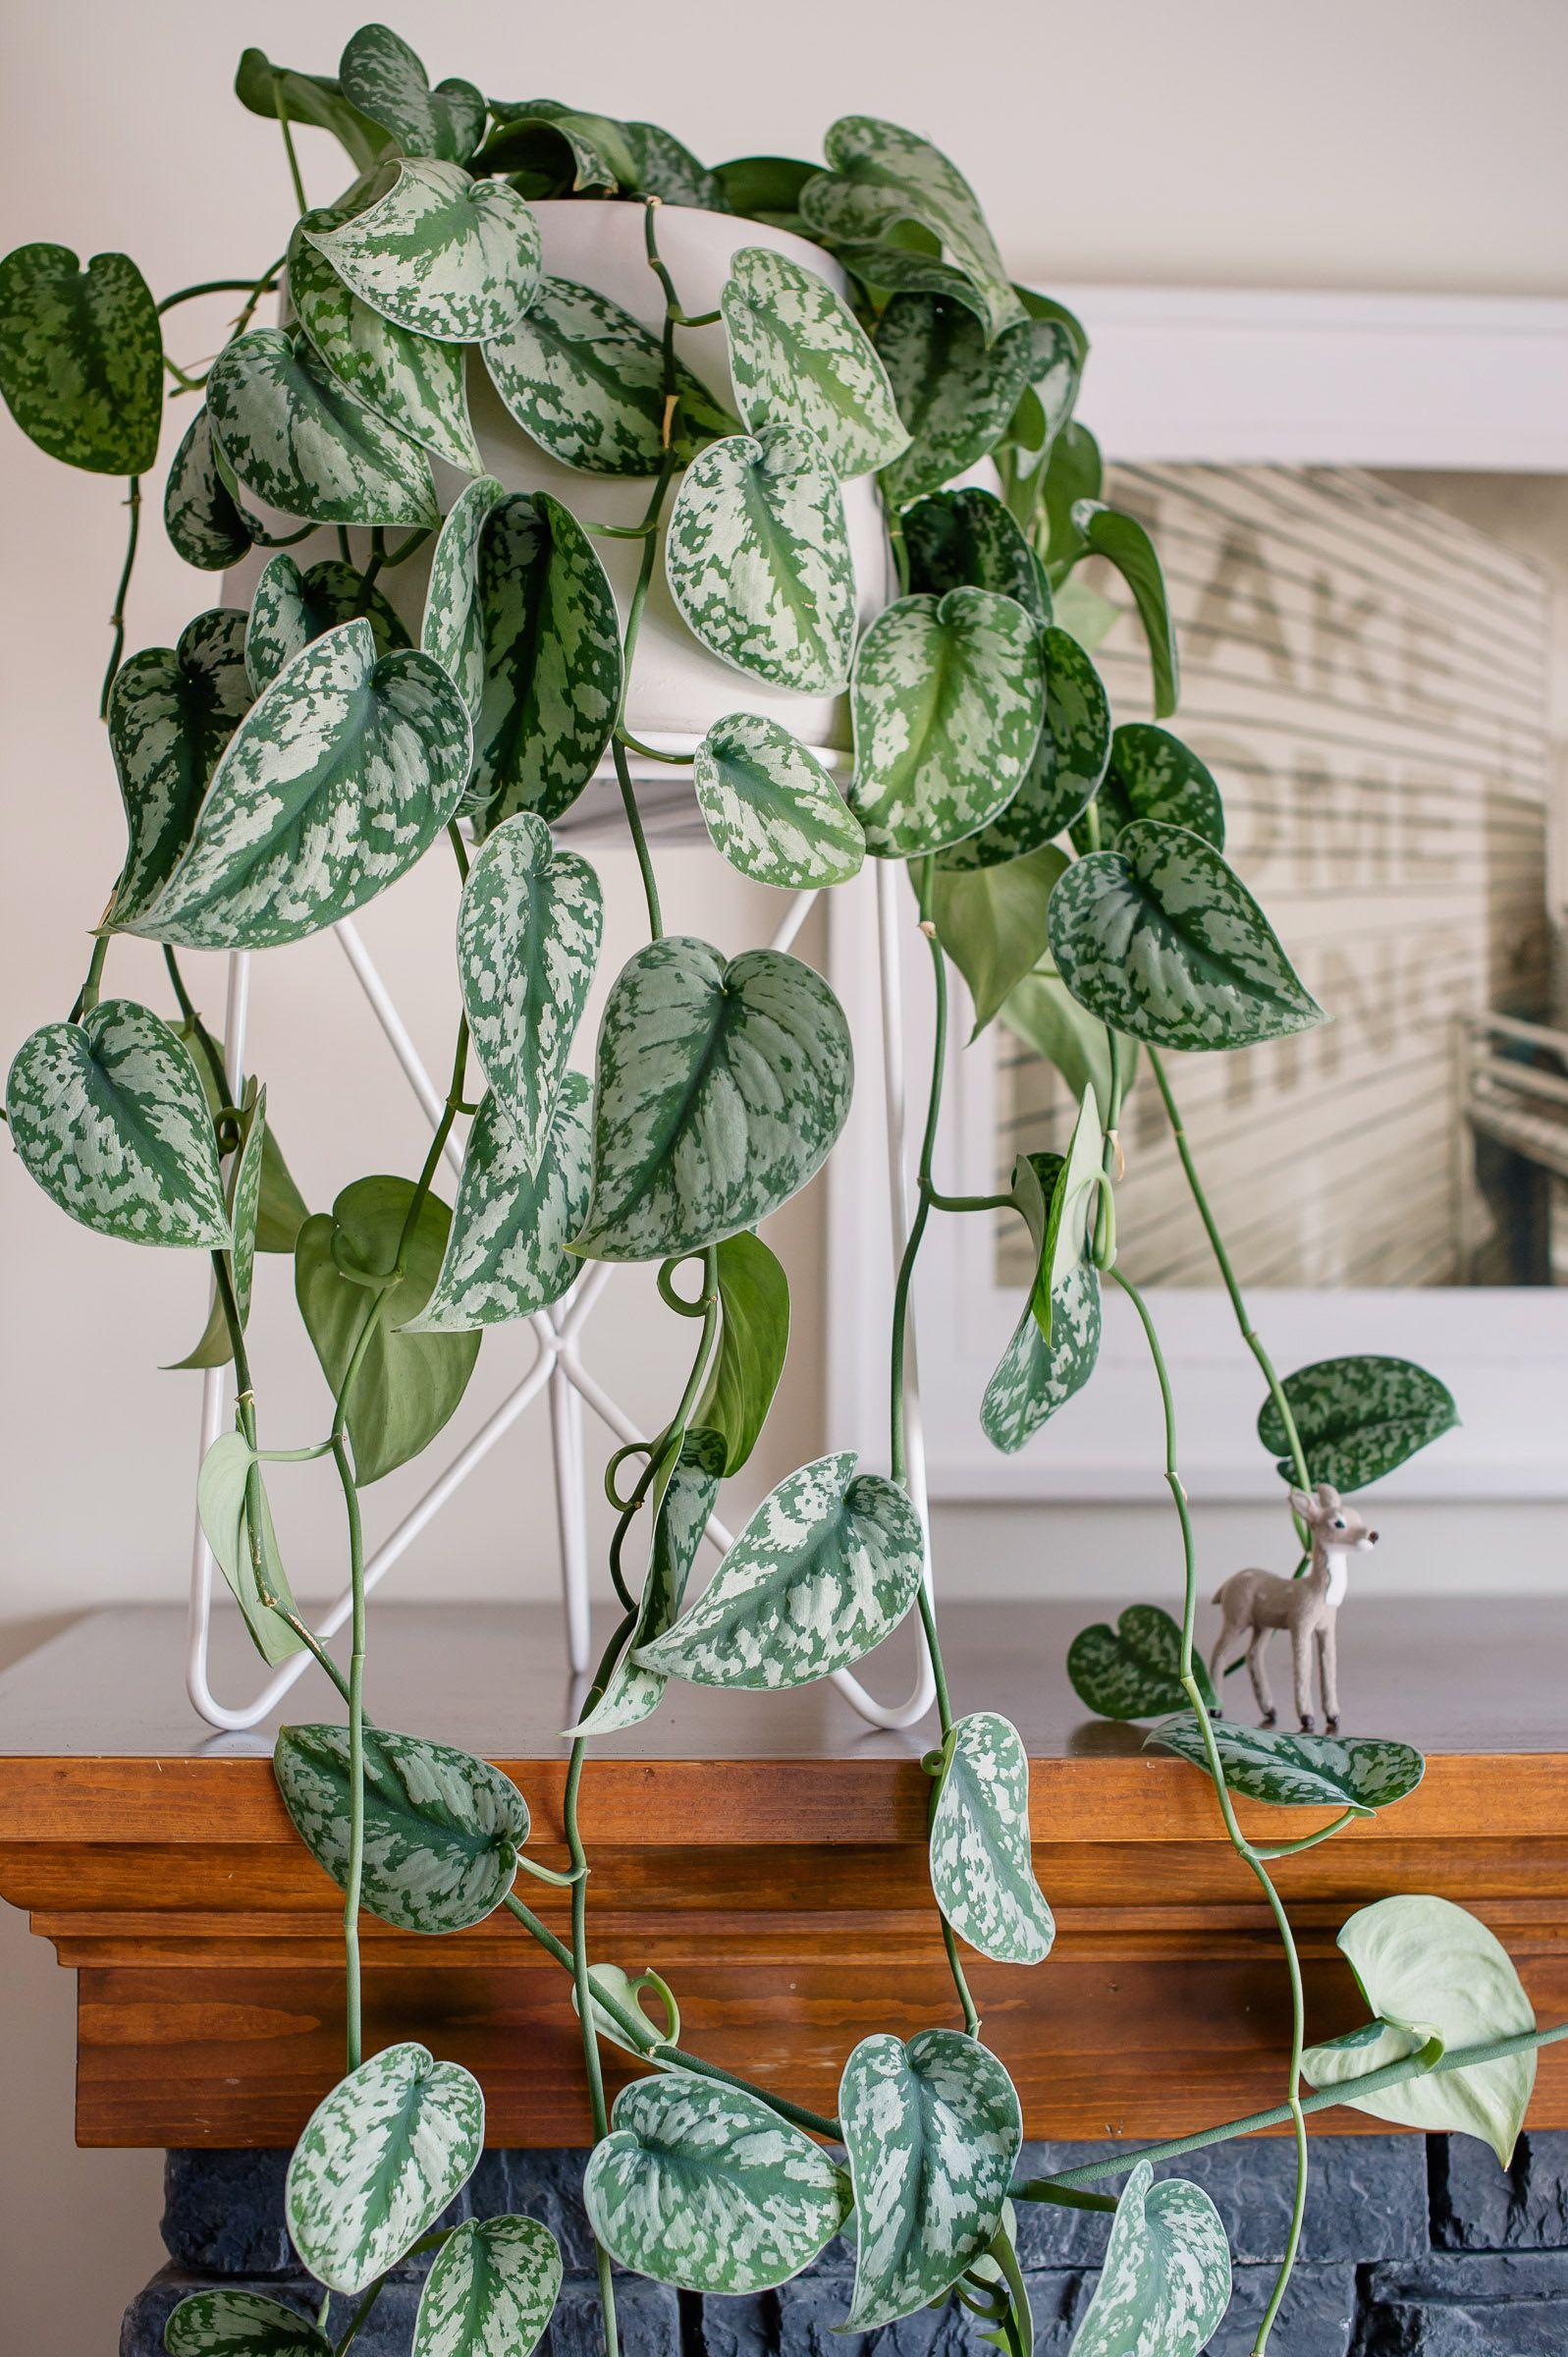 Satin or Silver Pothos #silverpothos #pothos #plants